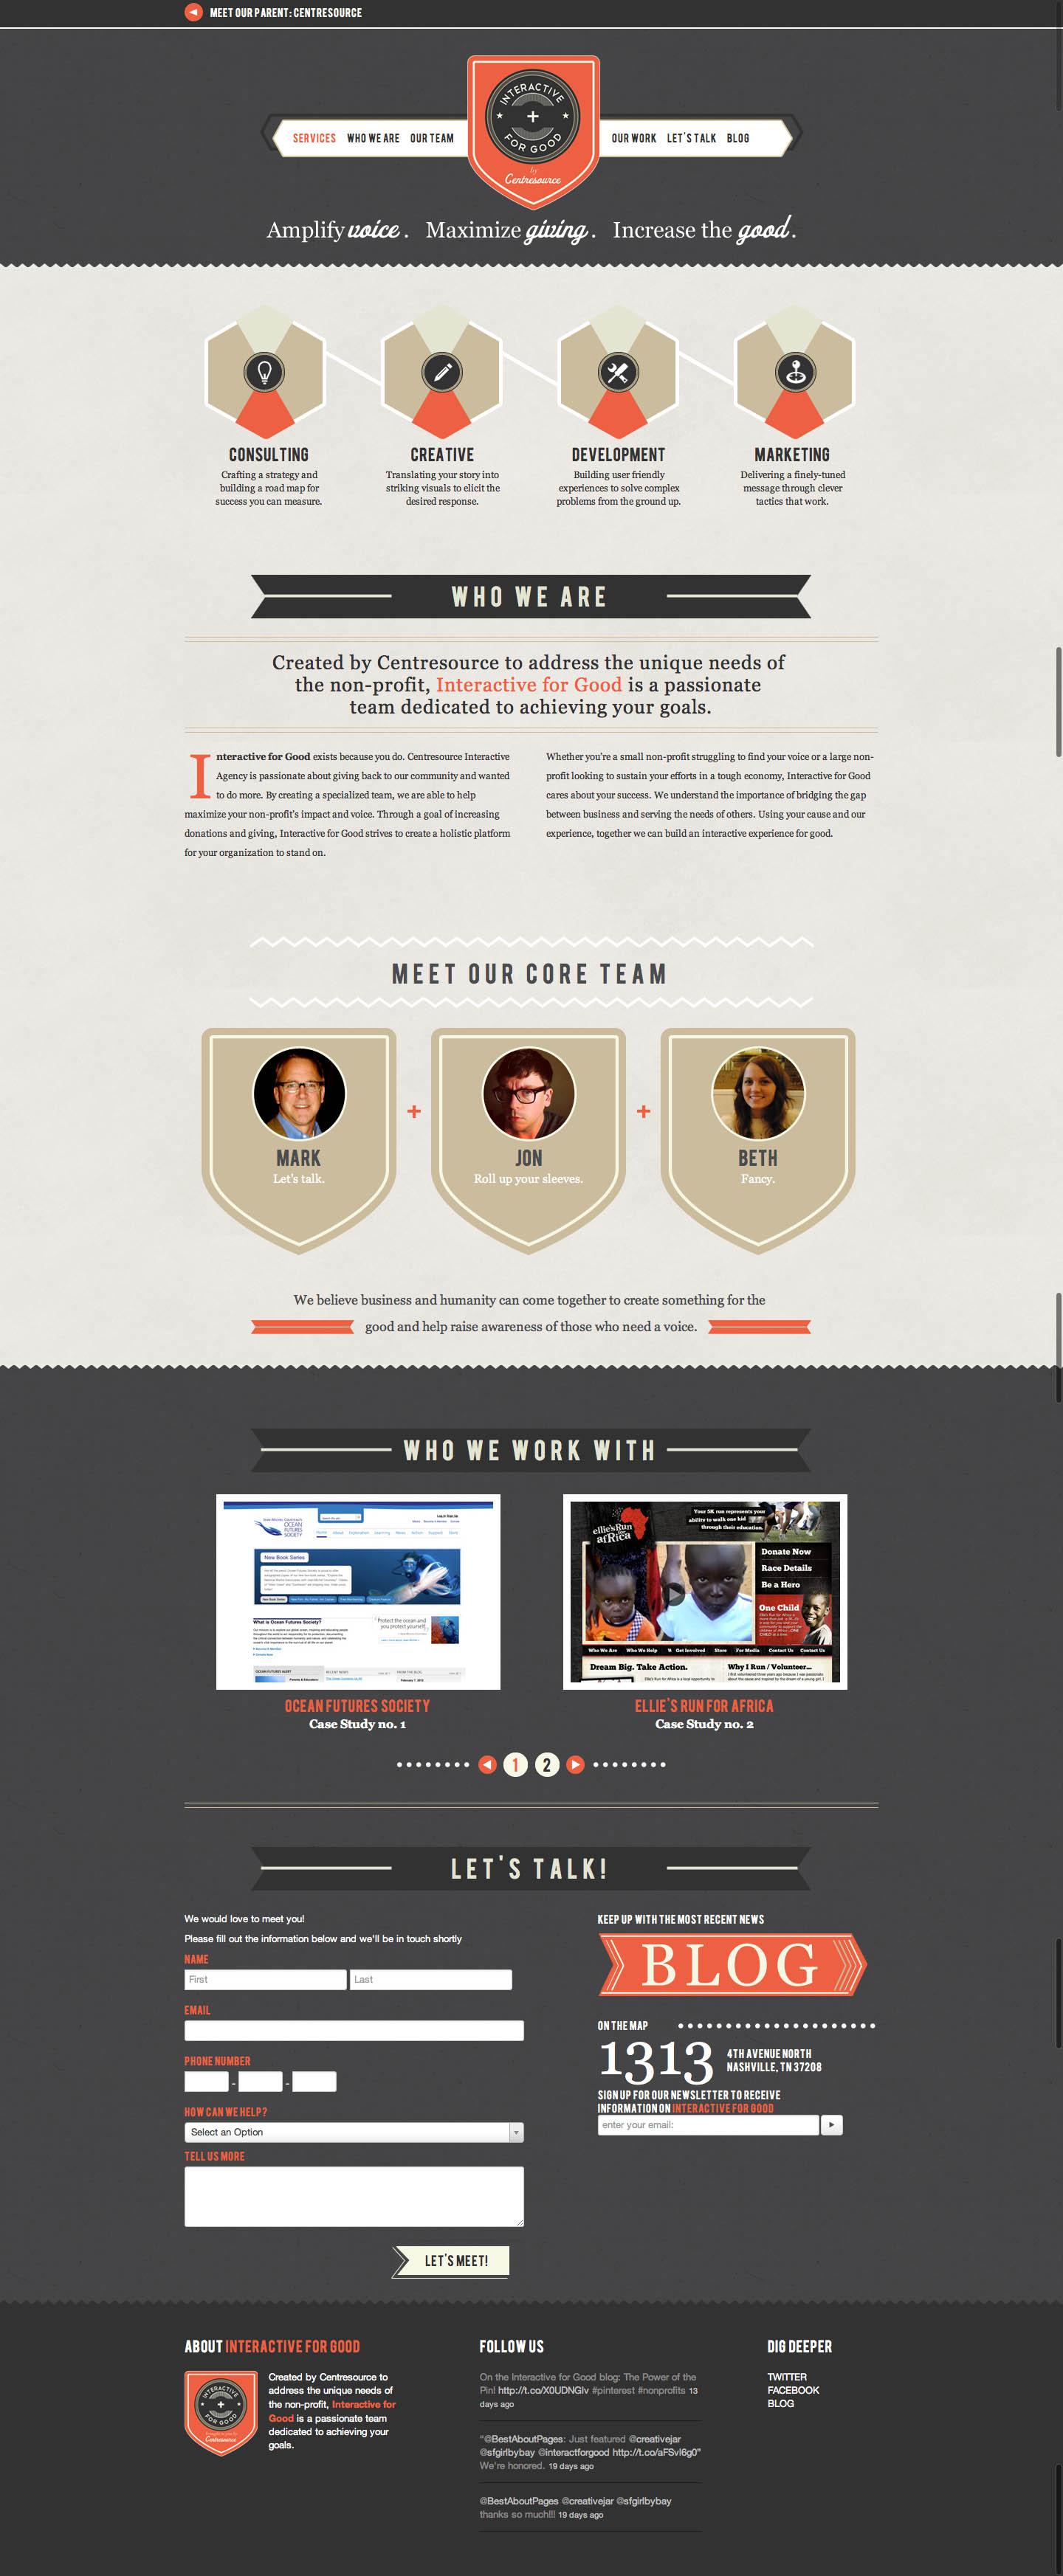 Interactive for Good Website Screenshot